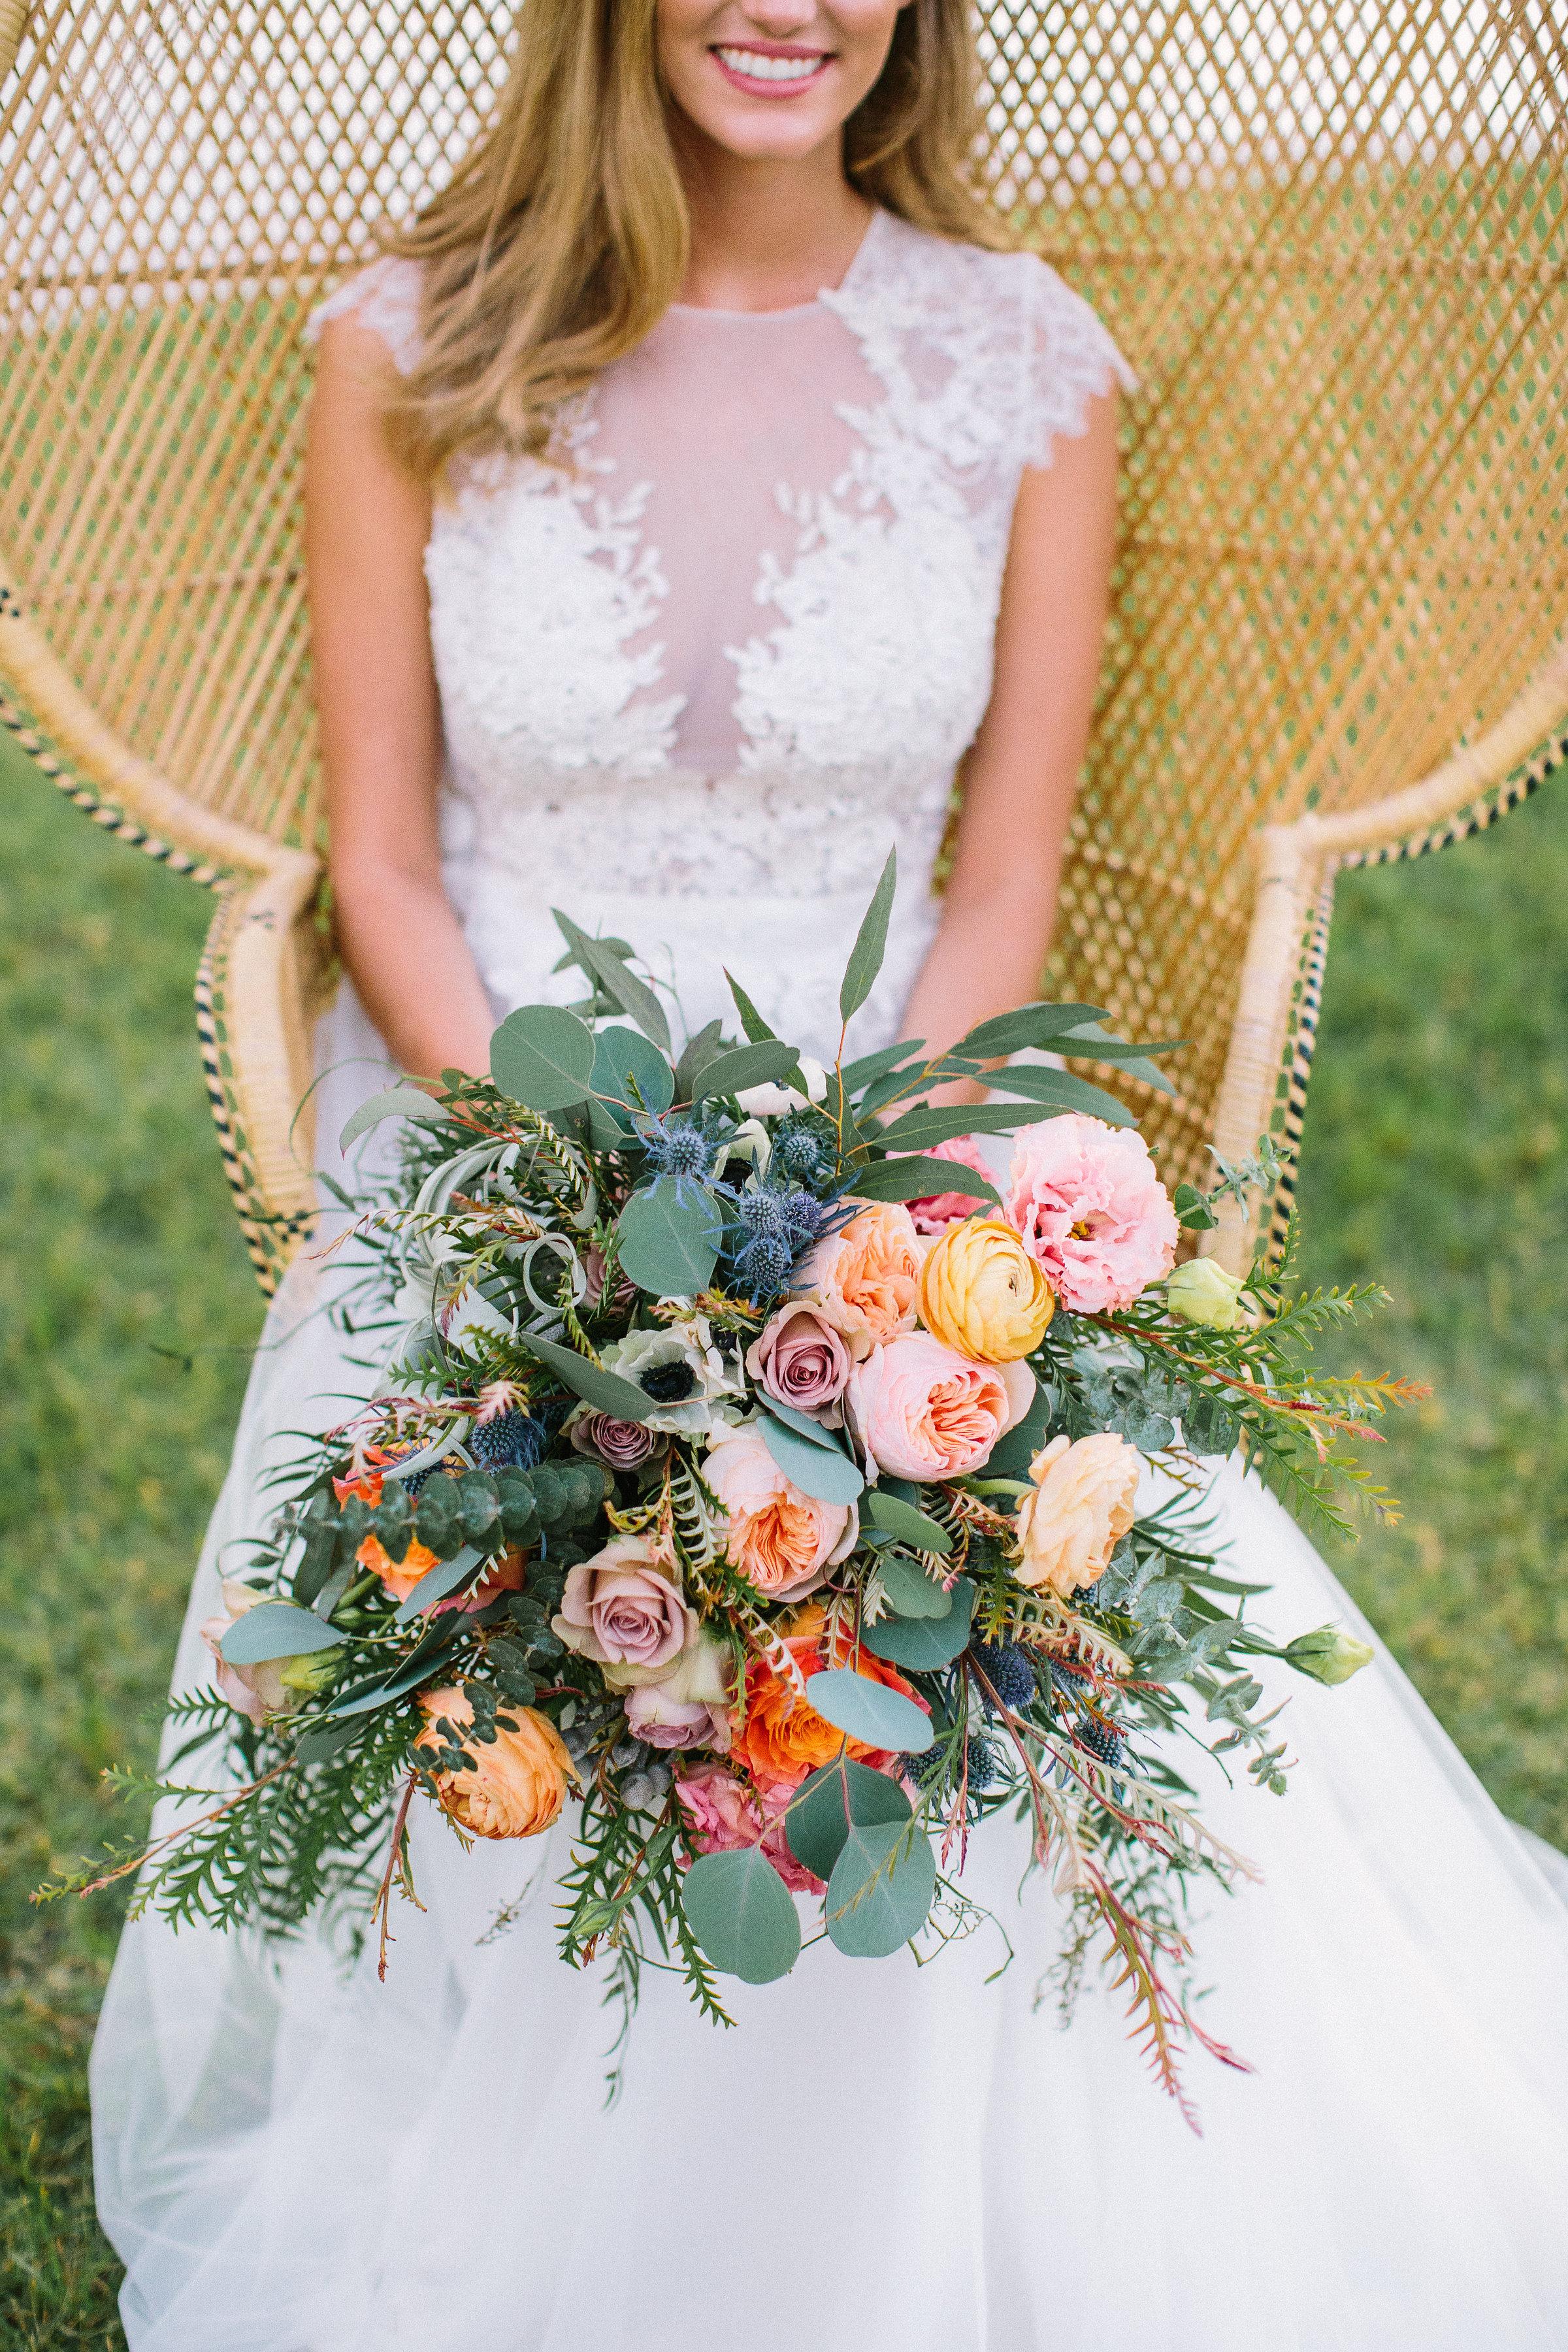 Ellen-Ashton-Photography-Peach-Creek-Ranch-Weddings-Wed-and-Prosper399.jpg